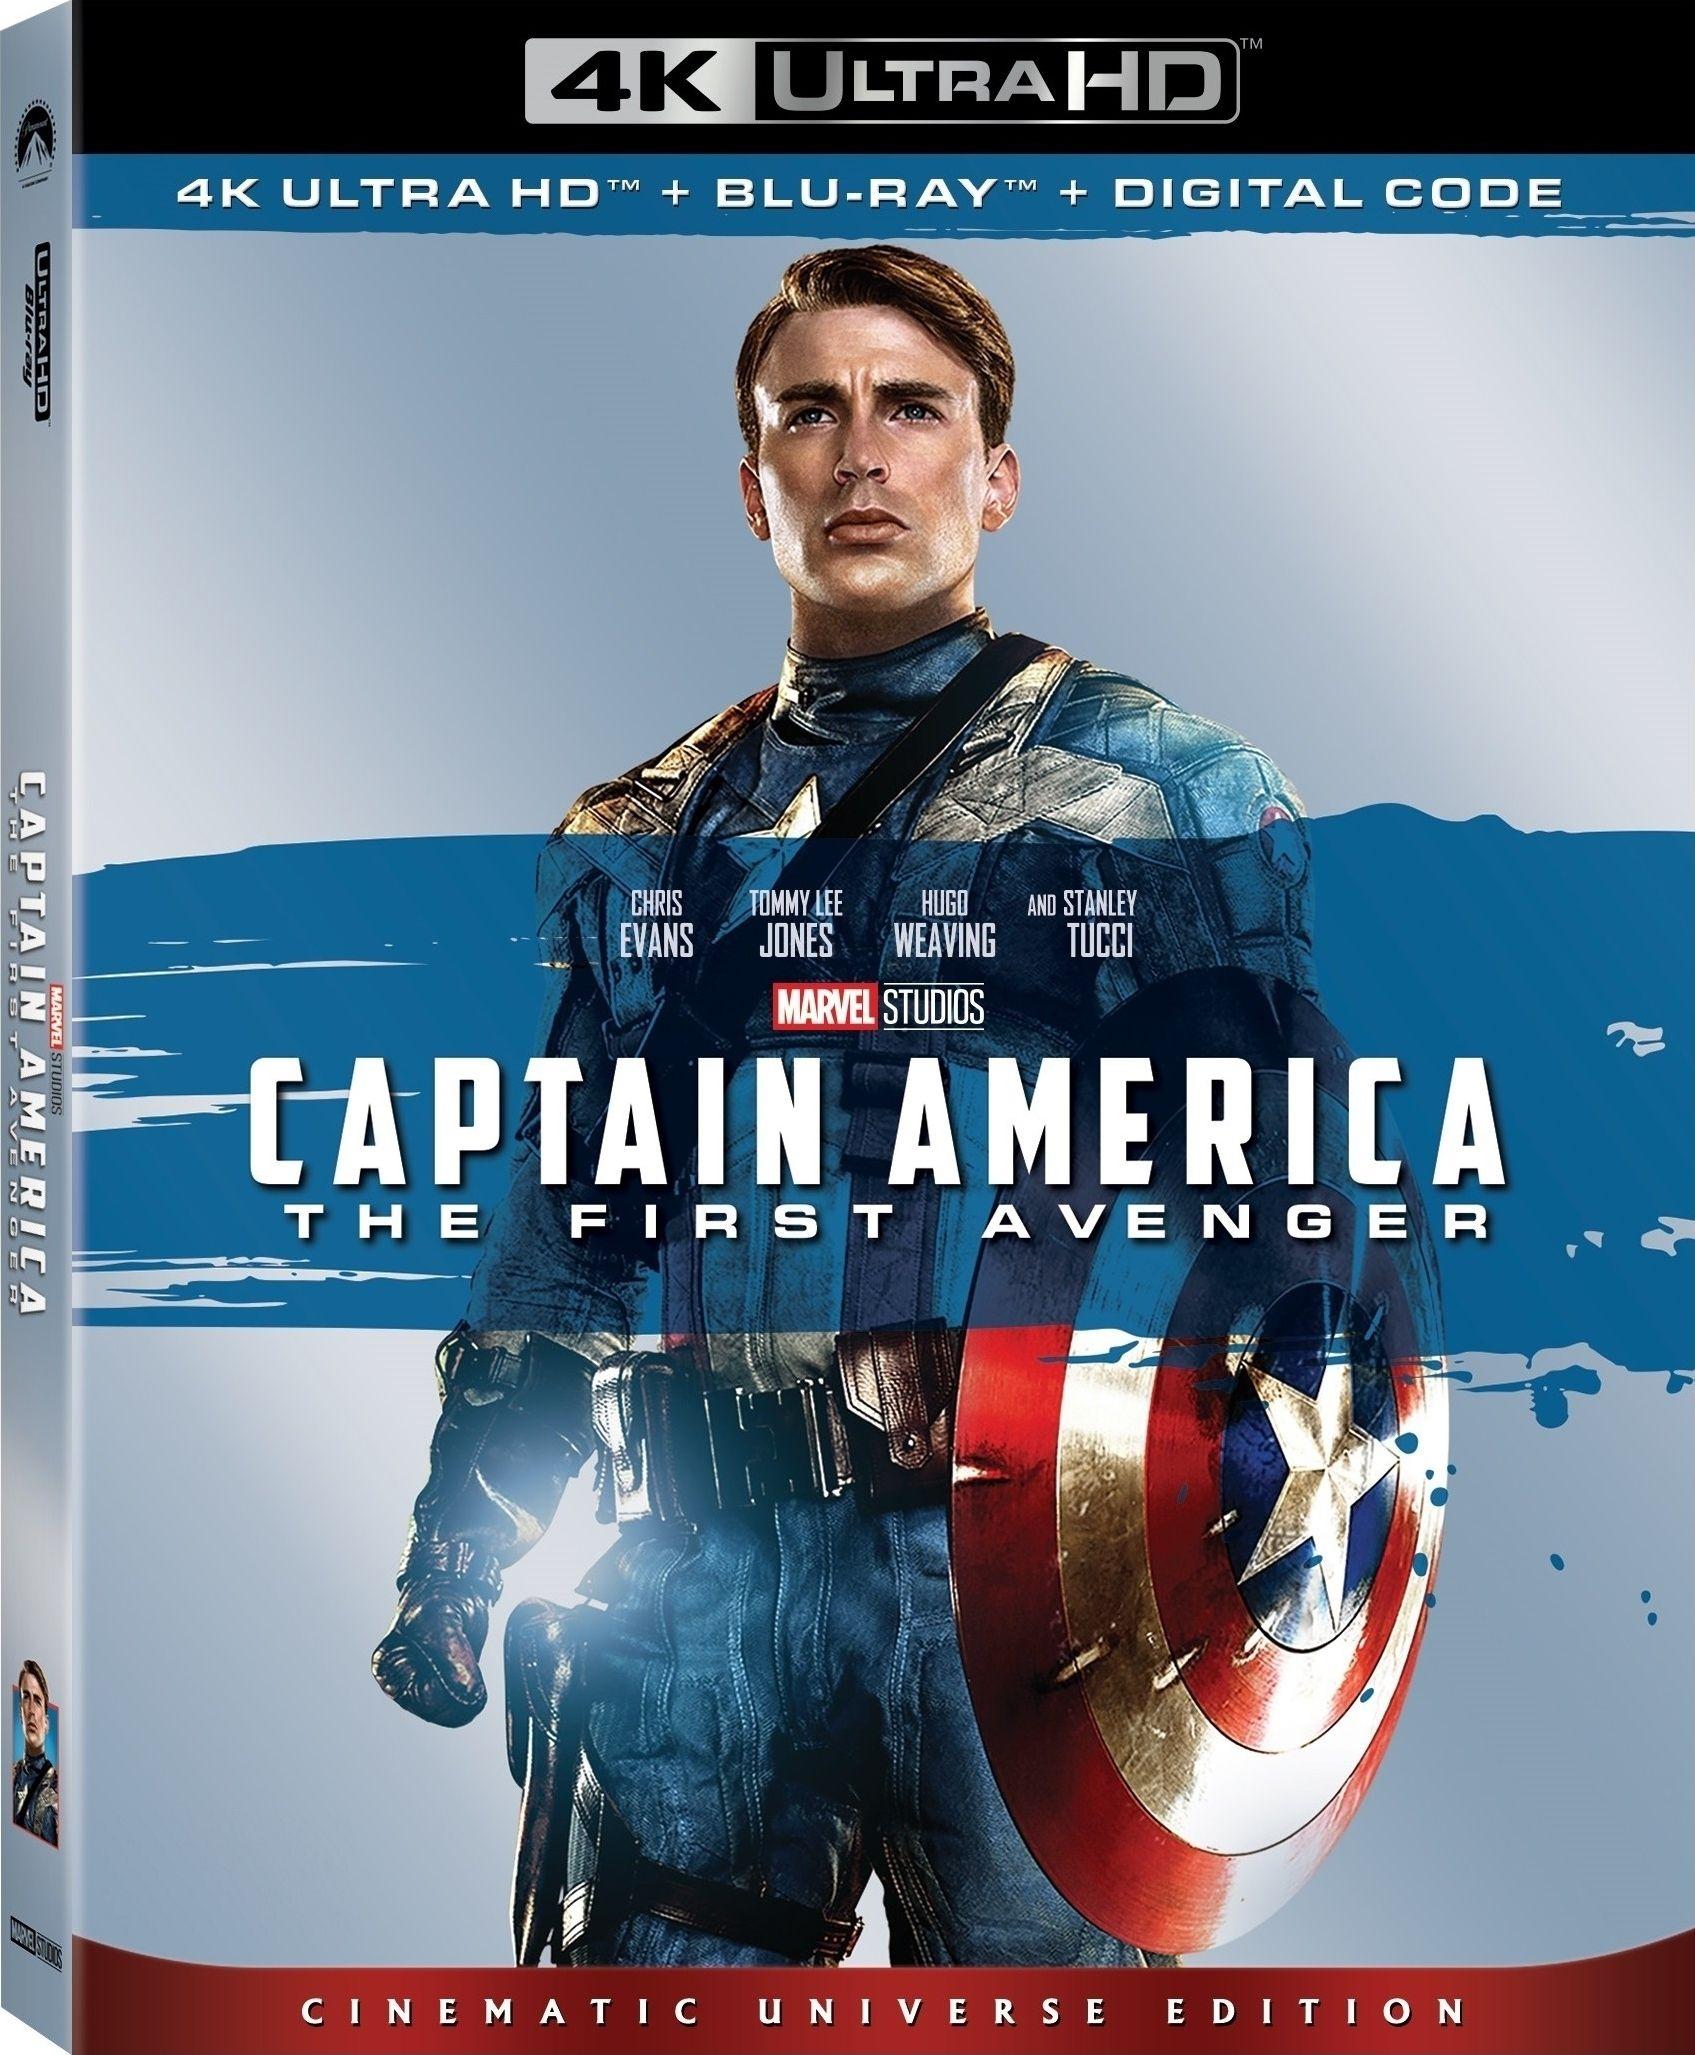 Captain America Peliculas Marvel Películas Completas Capitán América